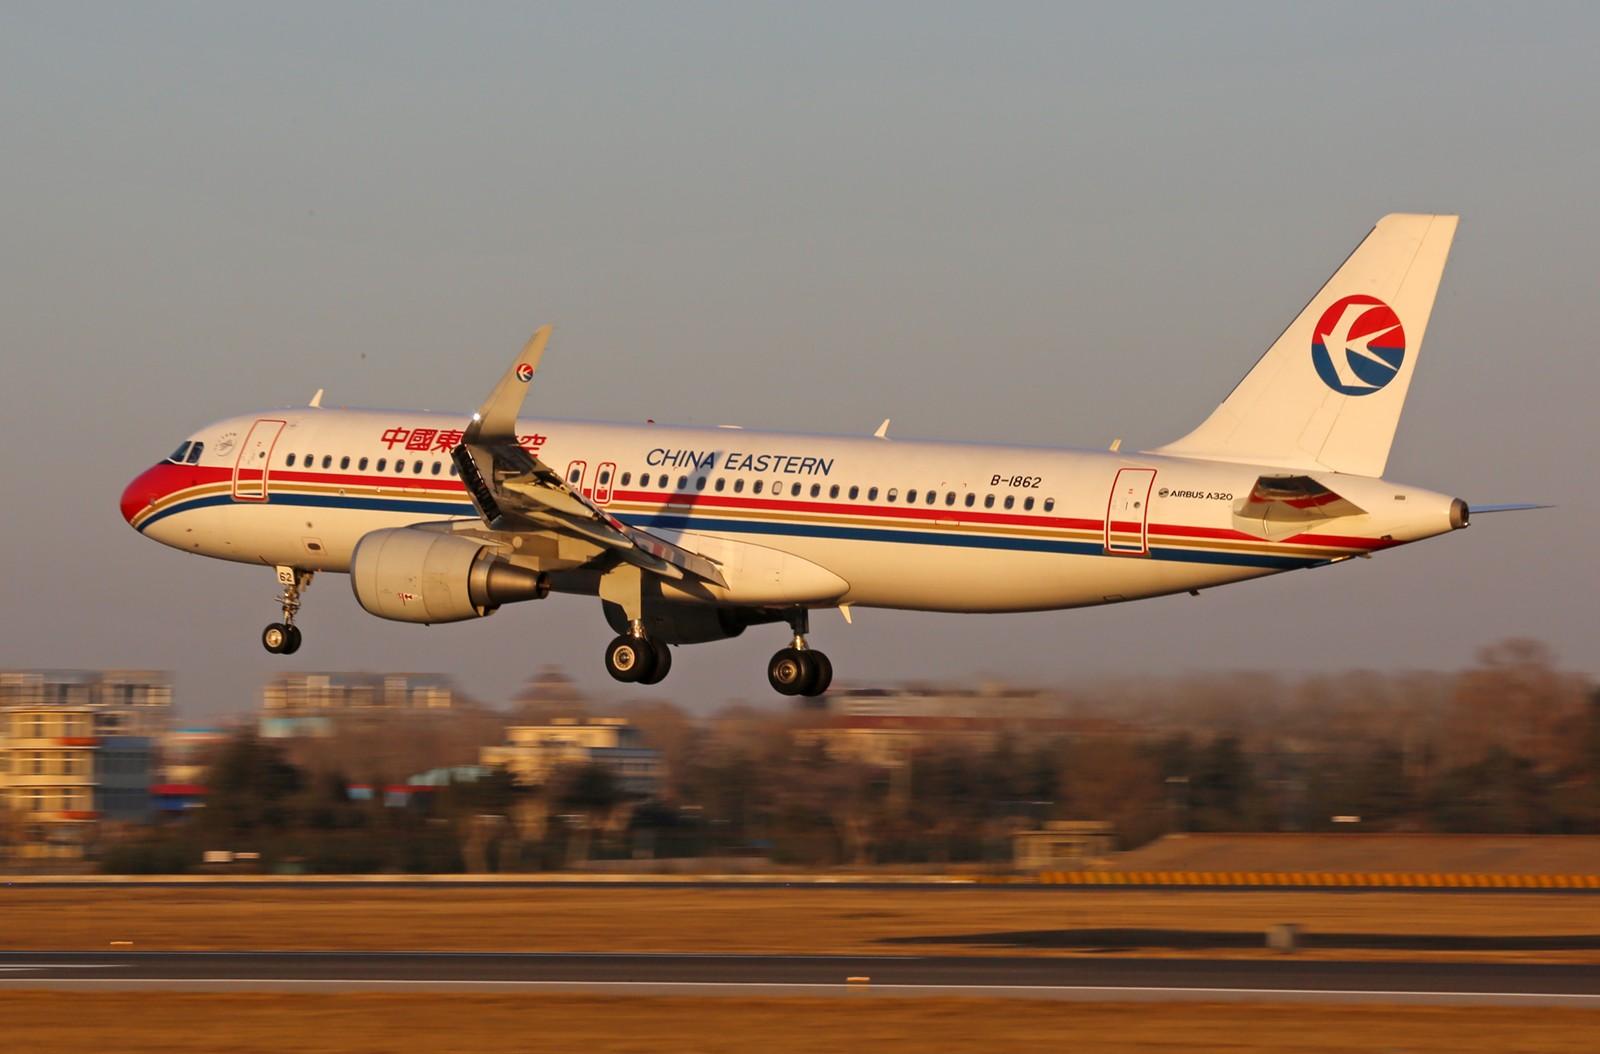 Re:[原创]【由青岛飞友会指定餐饮企业冠名播出】大约在最冷的冬季 唯好友和光线不可辜负 AIRBUS A320-200 B-1862 中国青岛流亭国际机场